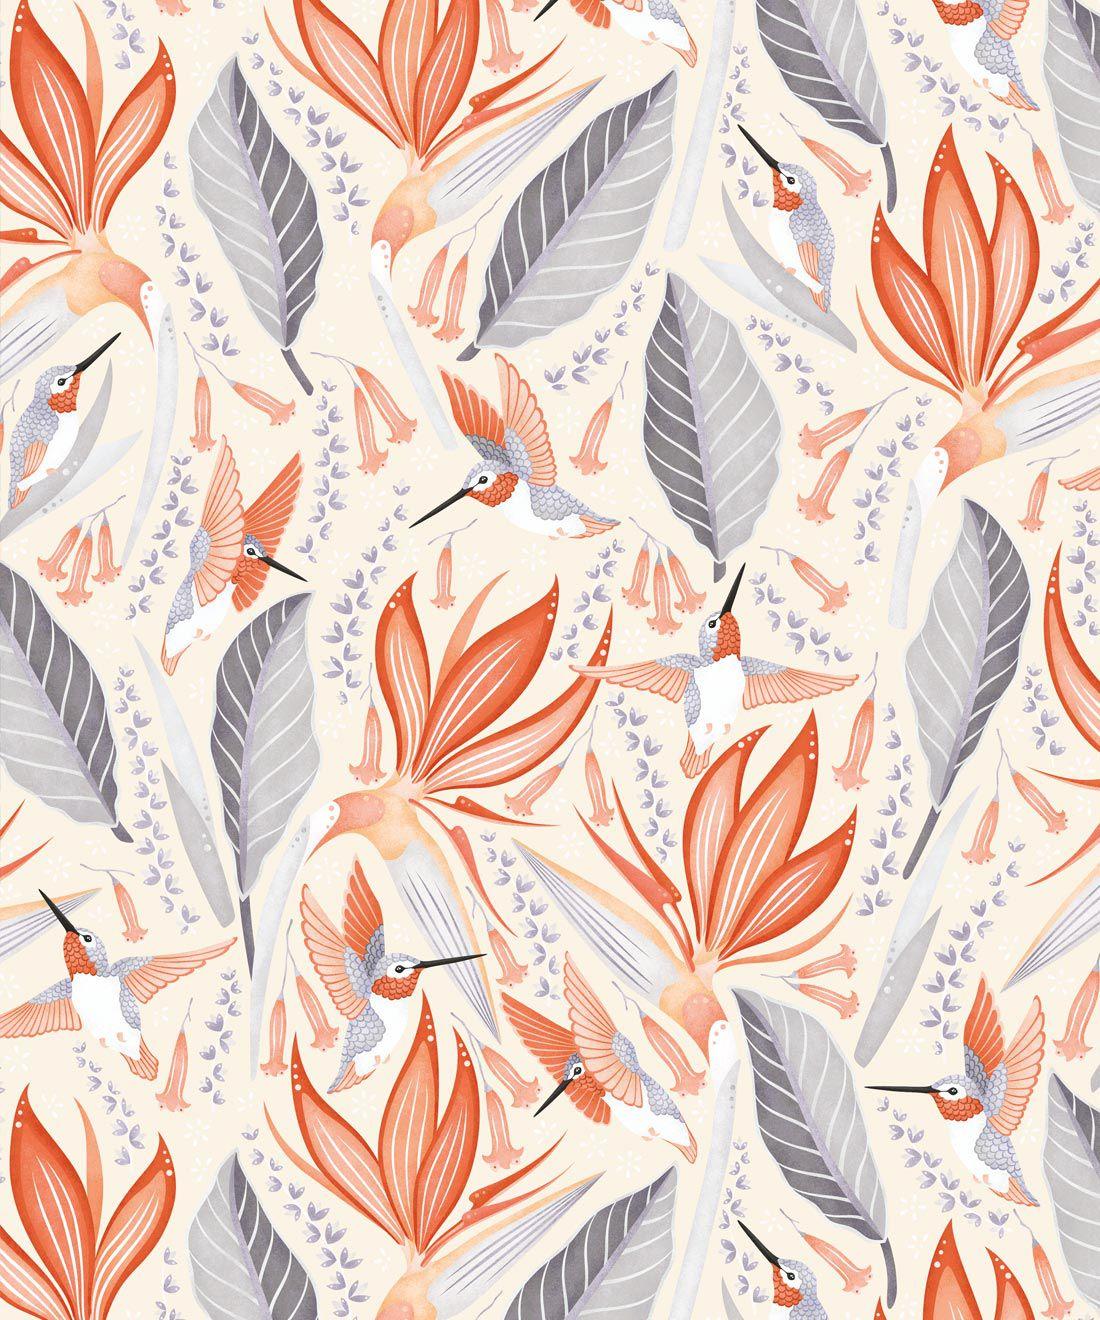 Hummingbird Wallpaper • Birds Of Paradise Flower • Bird Wallpaper